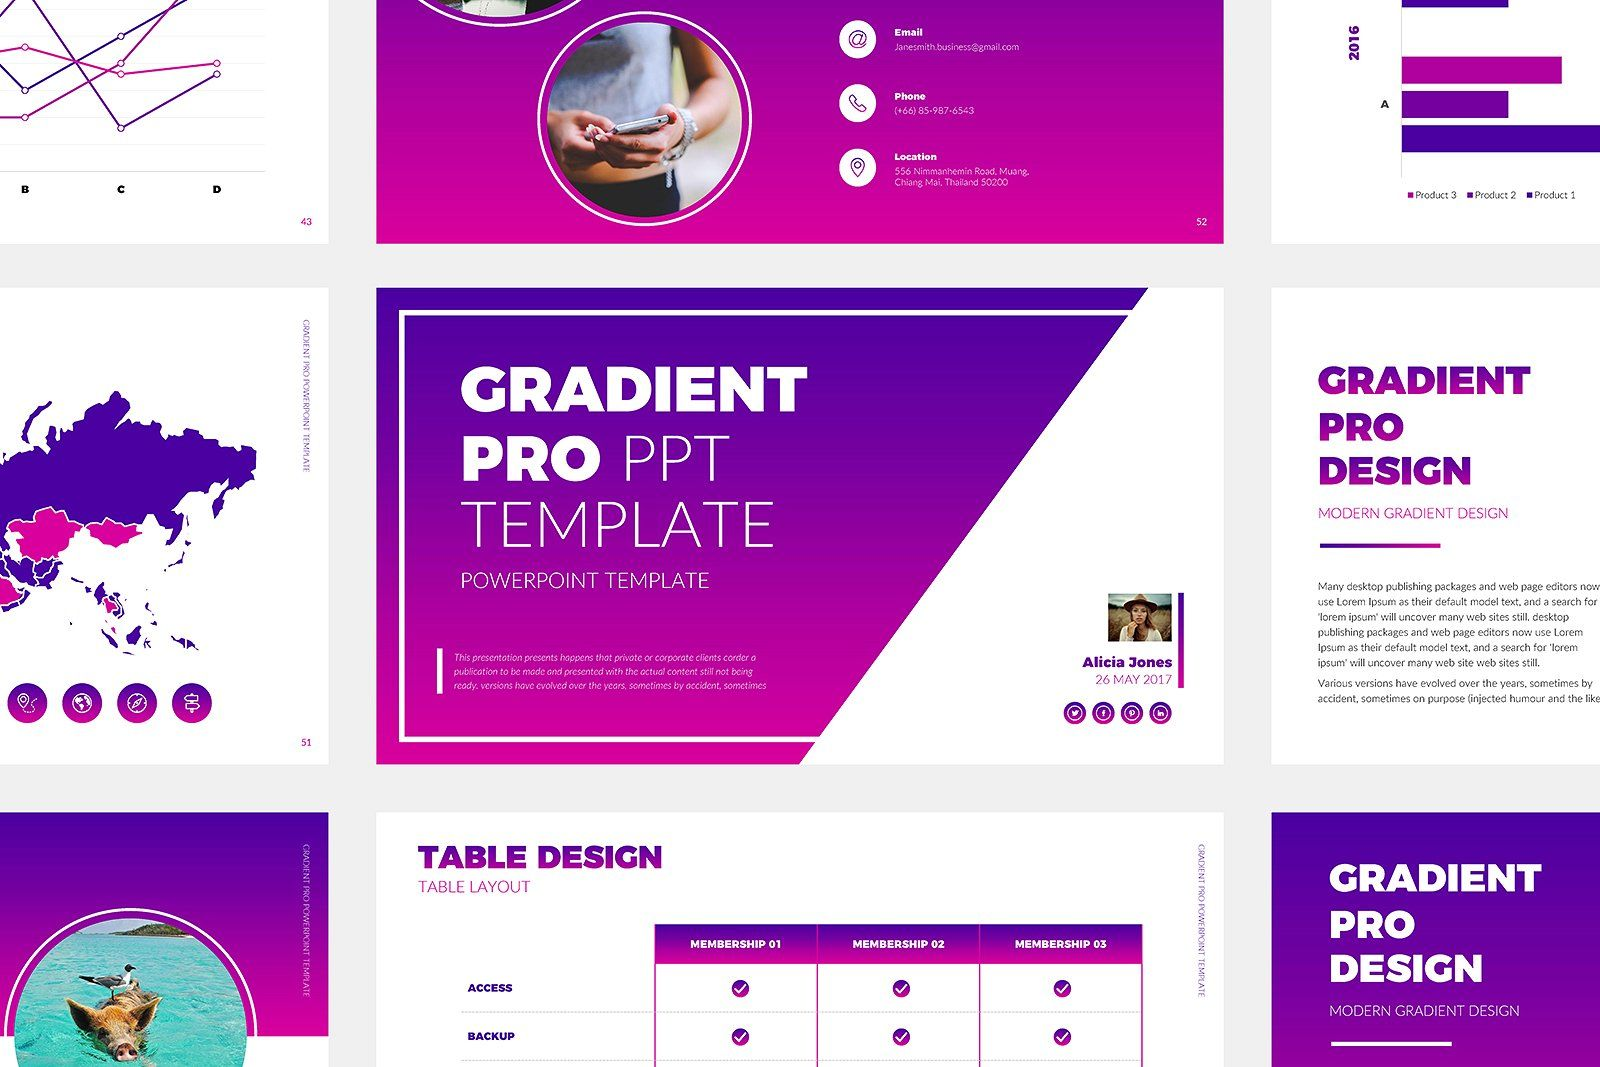 Gradient Pro Powerpoint Template Powerpoint Templates Templates Power Point Template